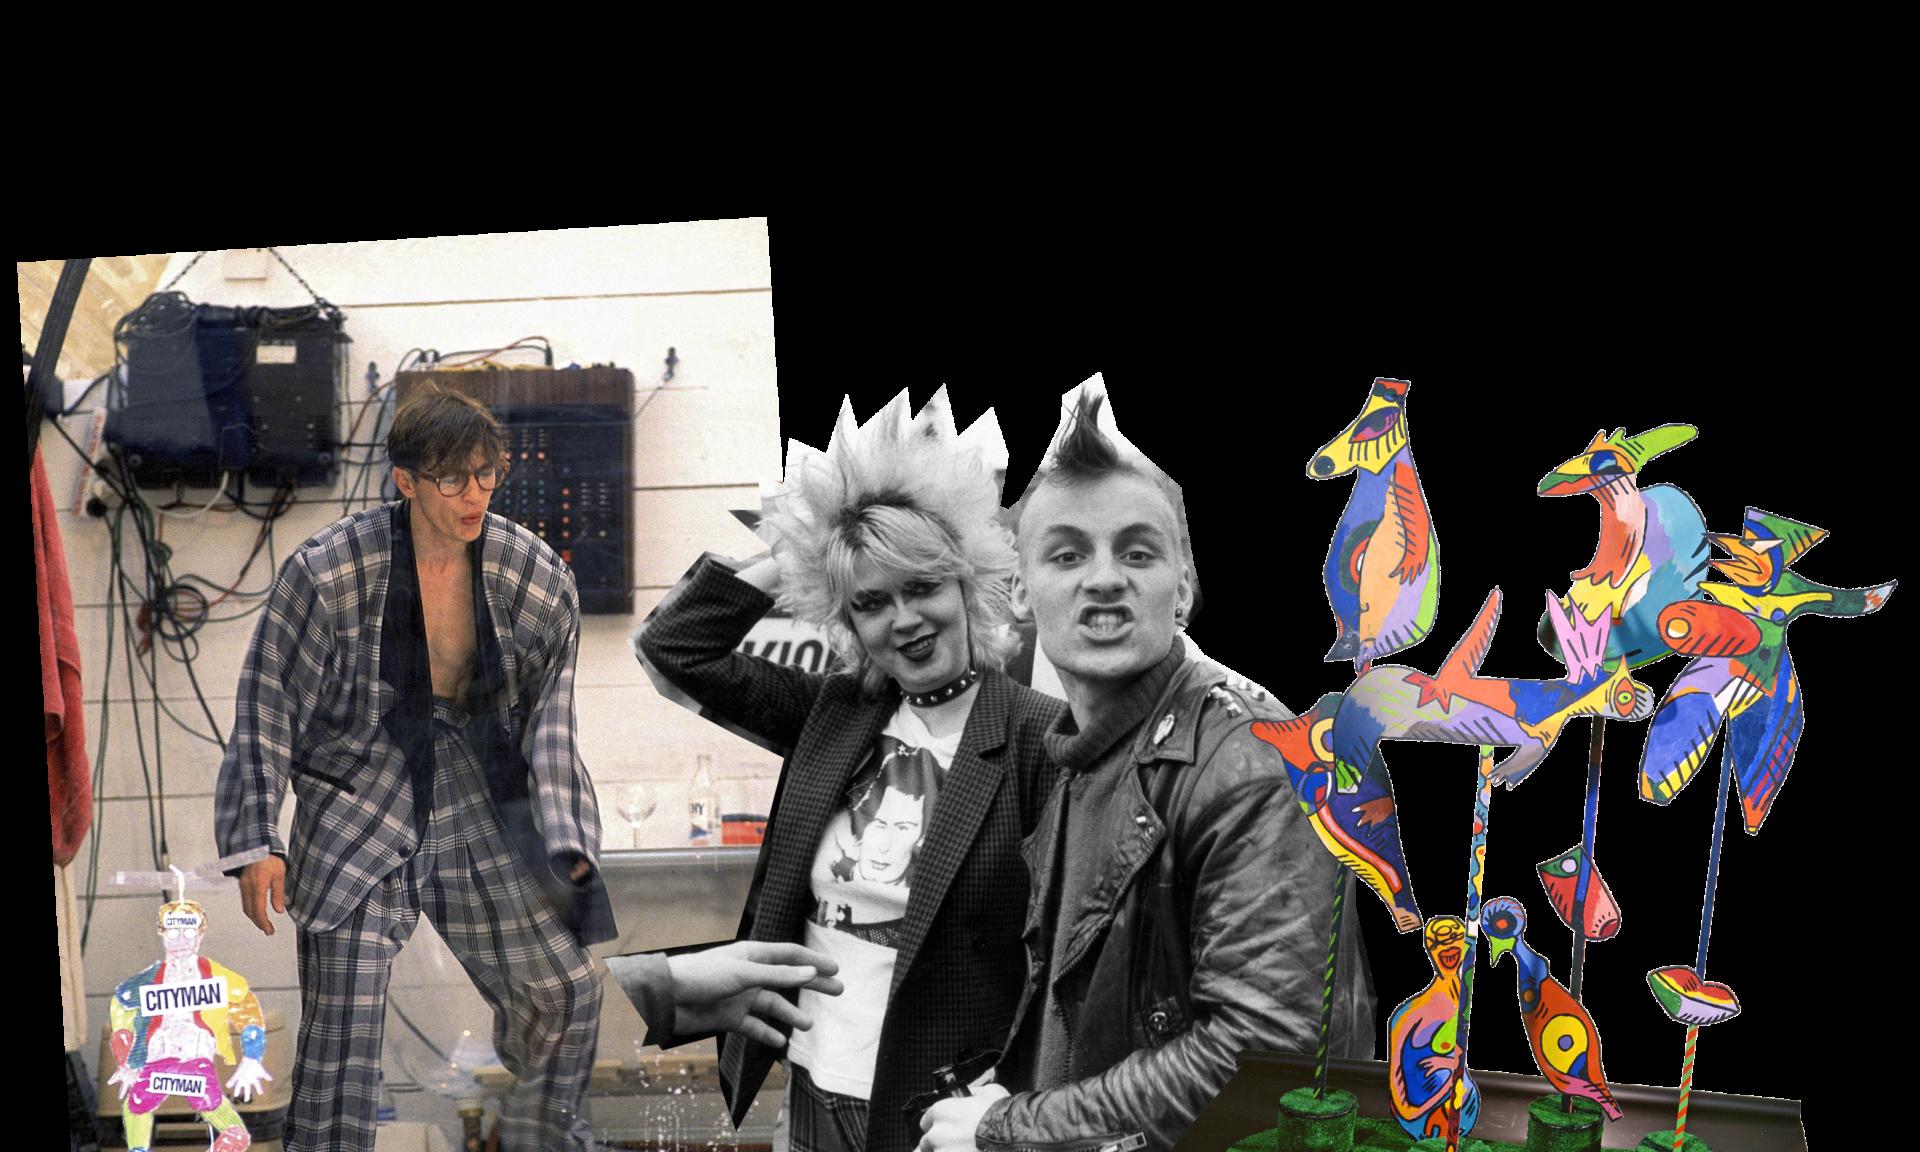 Reijo Kelan performanssi Cityman (1989), punk-aate ja Cris af Enehiemin Tyypit (1984) tiivistivät ajan hengen.